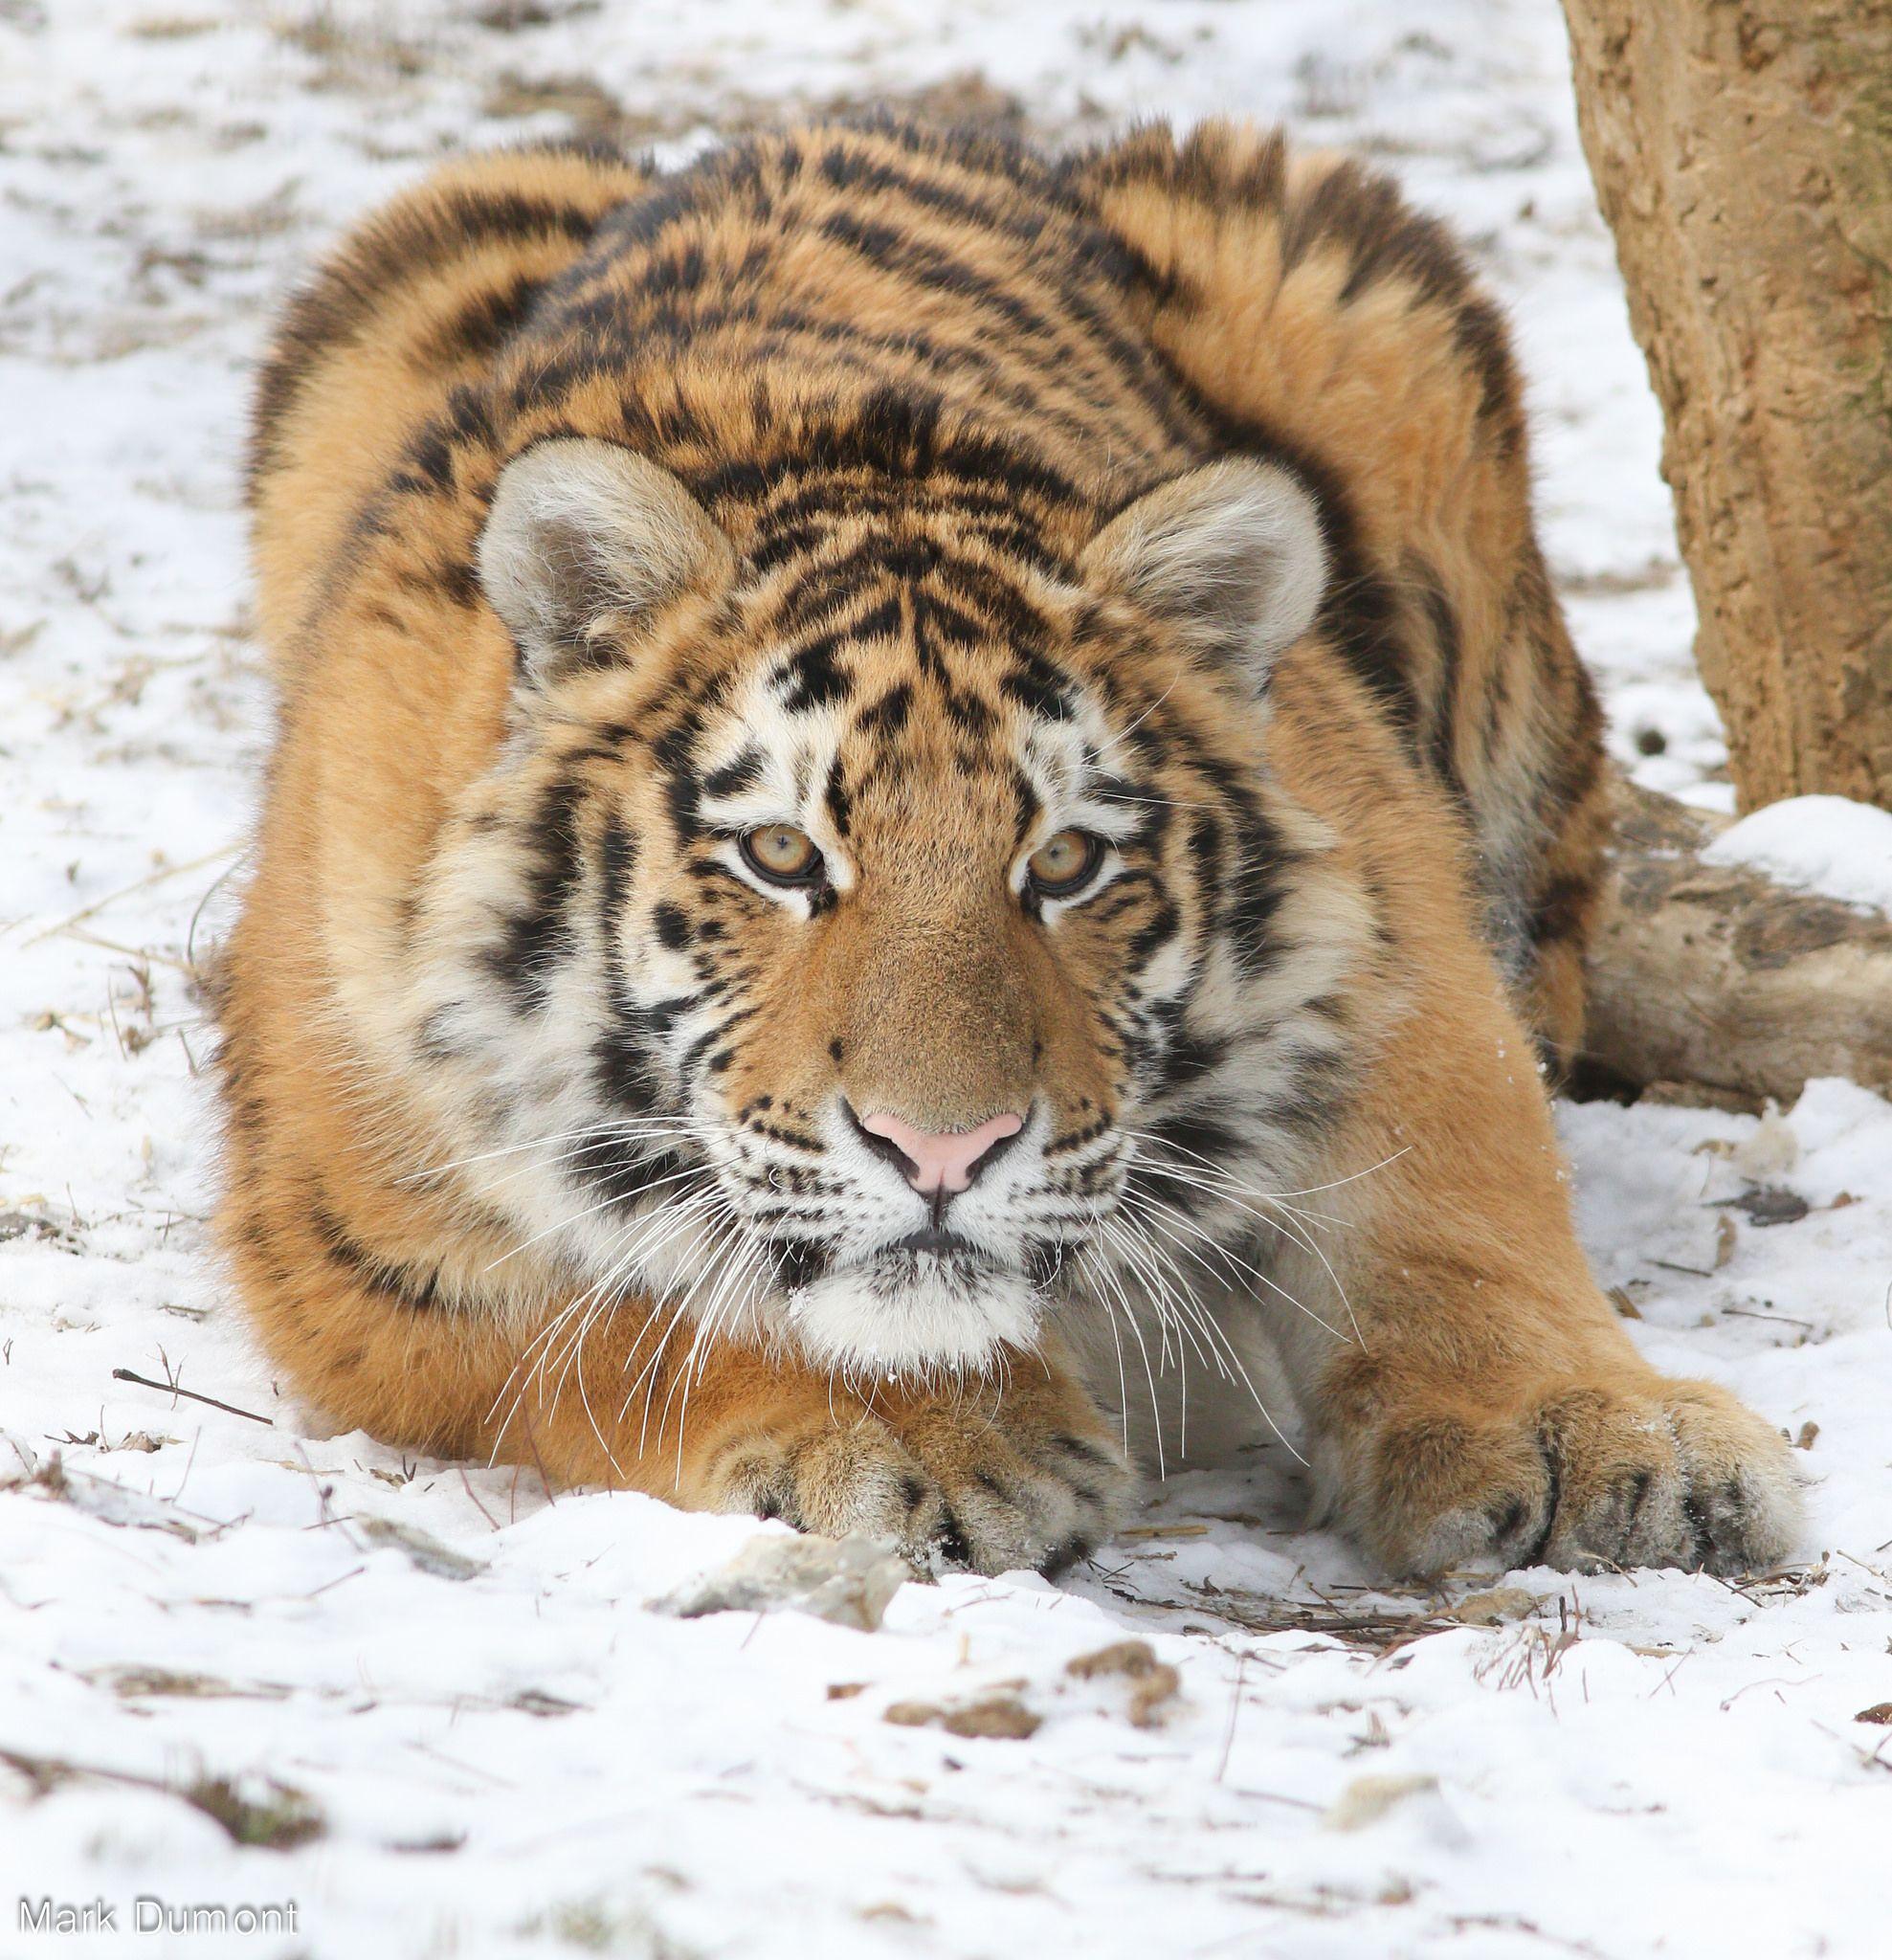 Columbus Zoo - Tiger Cub